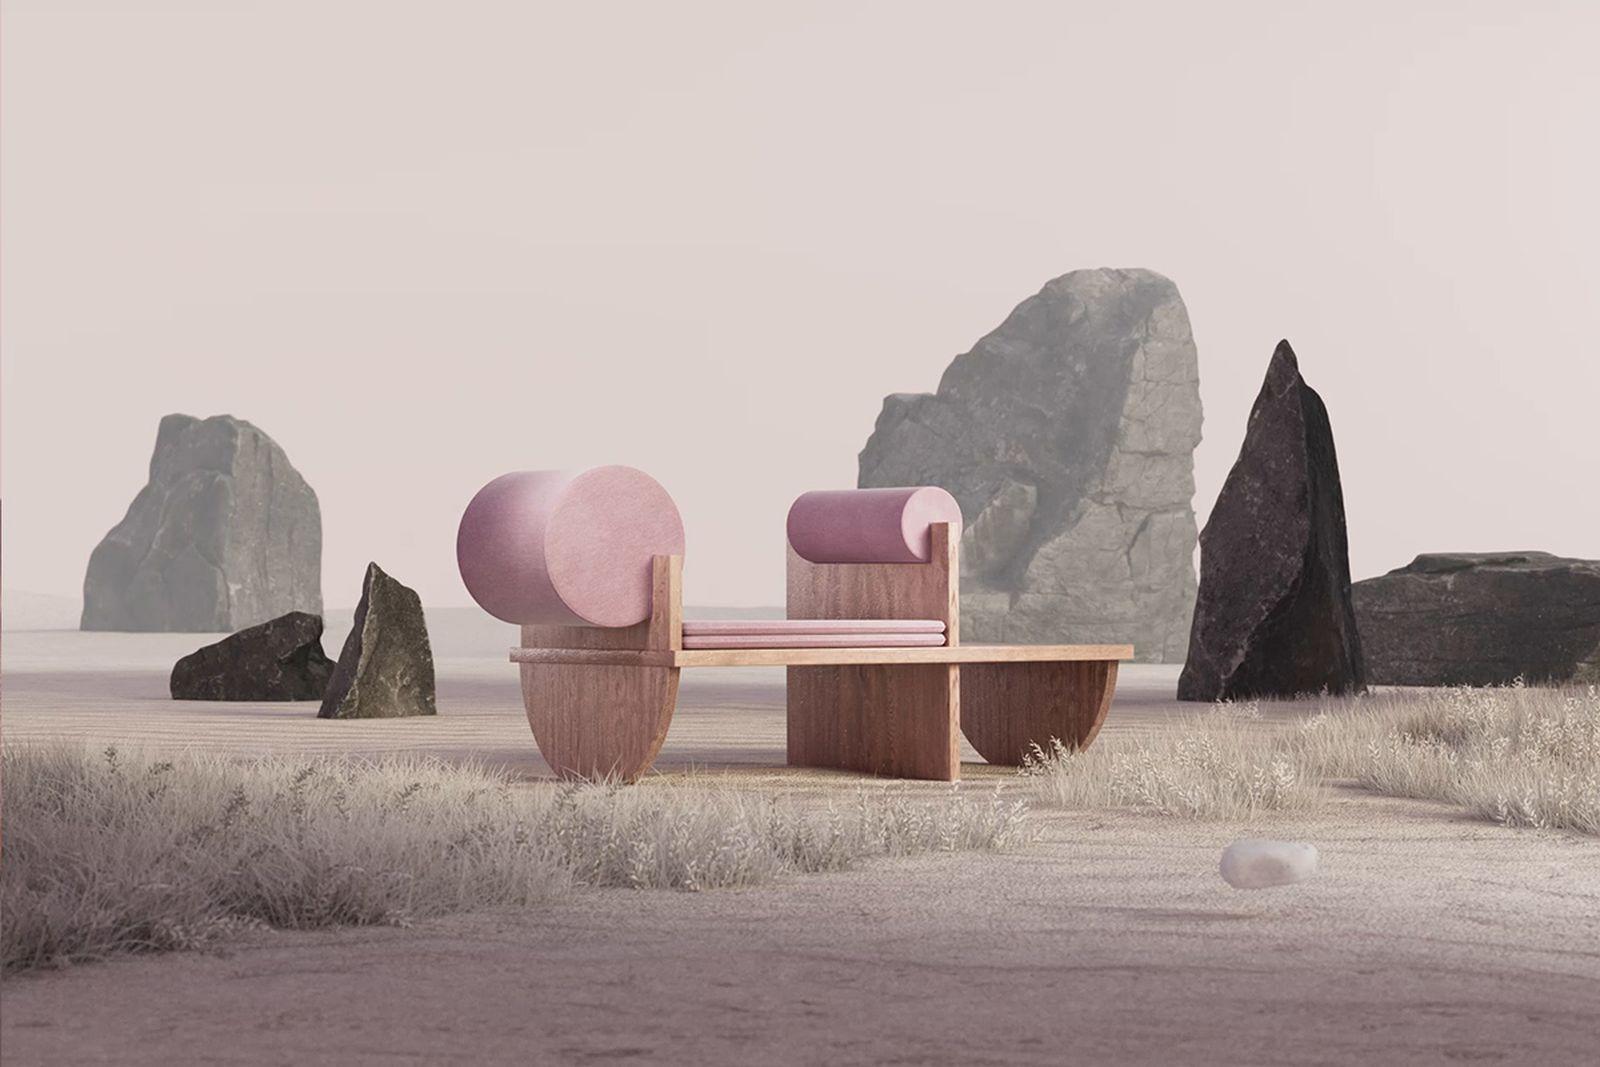 andres-reisinger-the-shipping-digital-furniture-auction-07